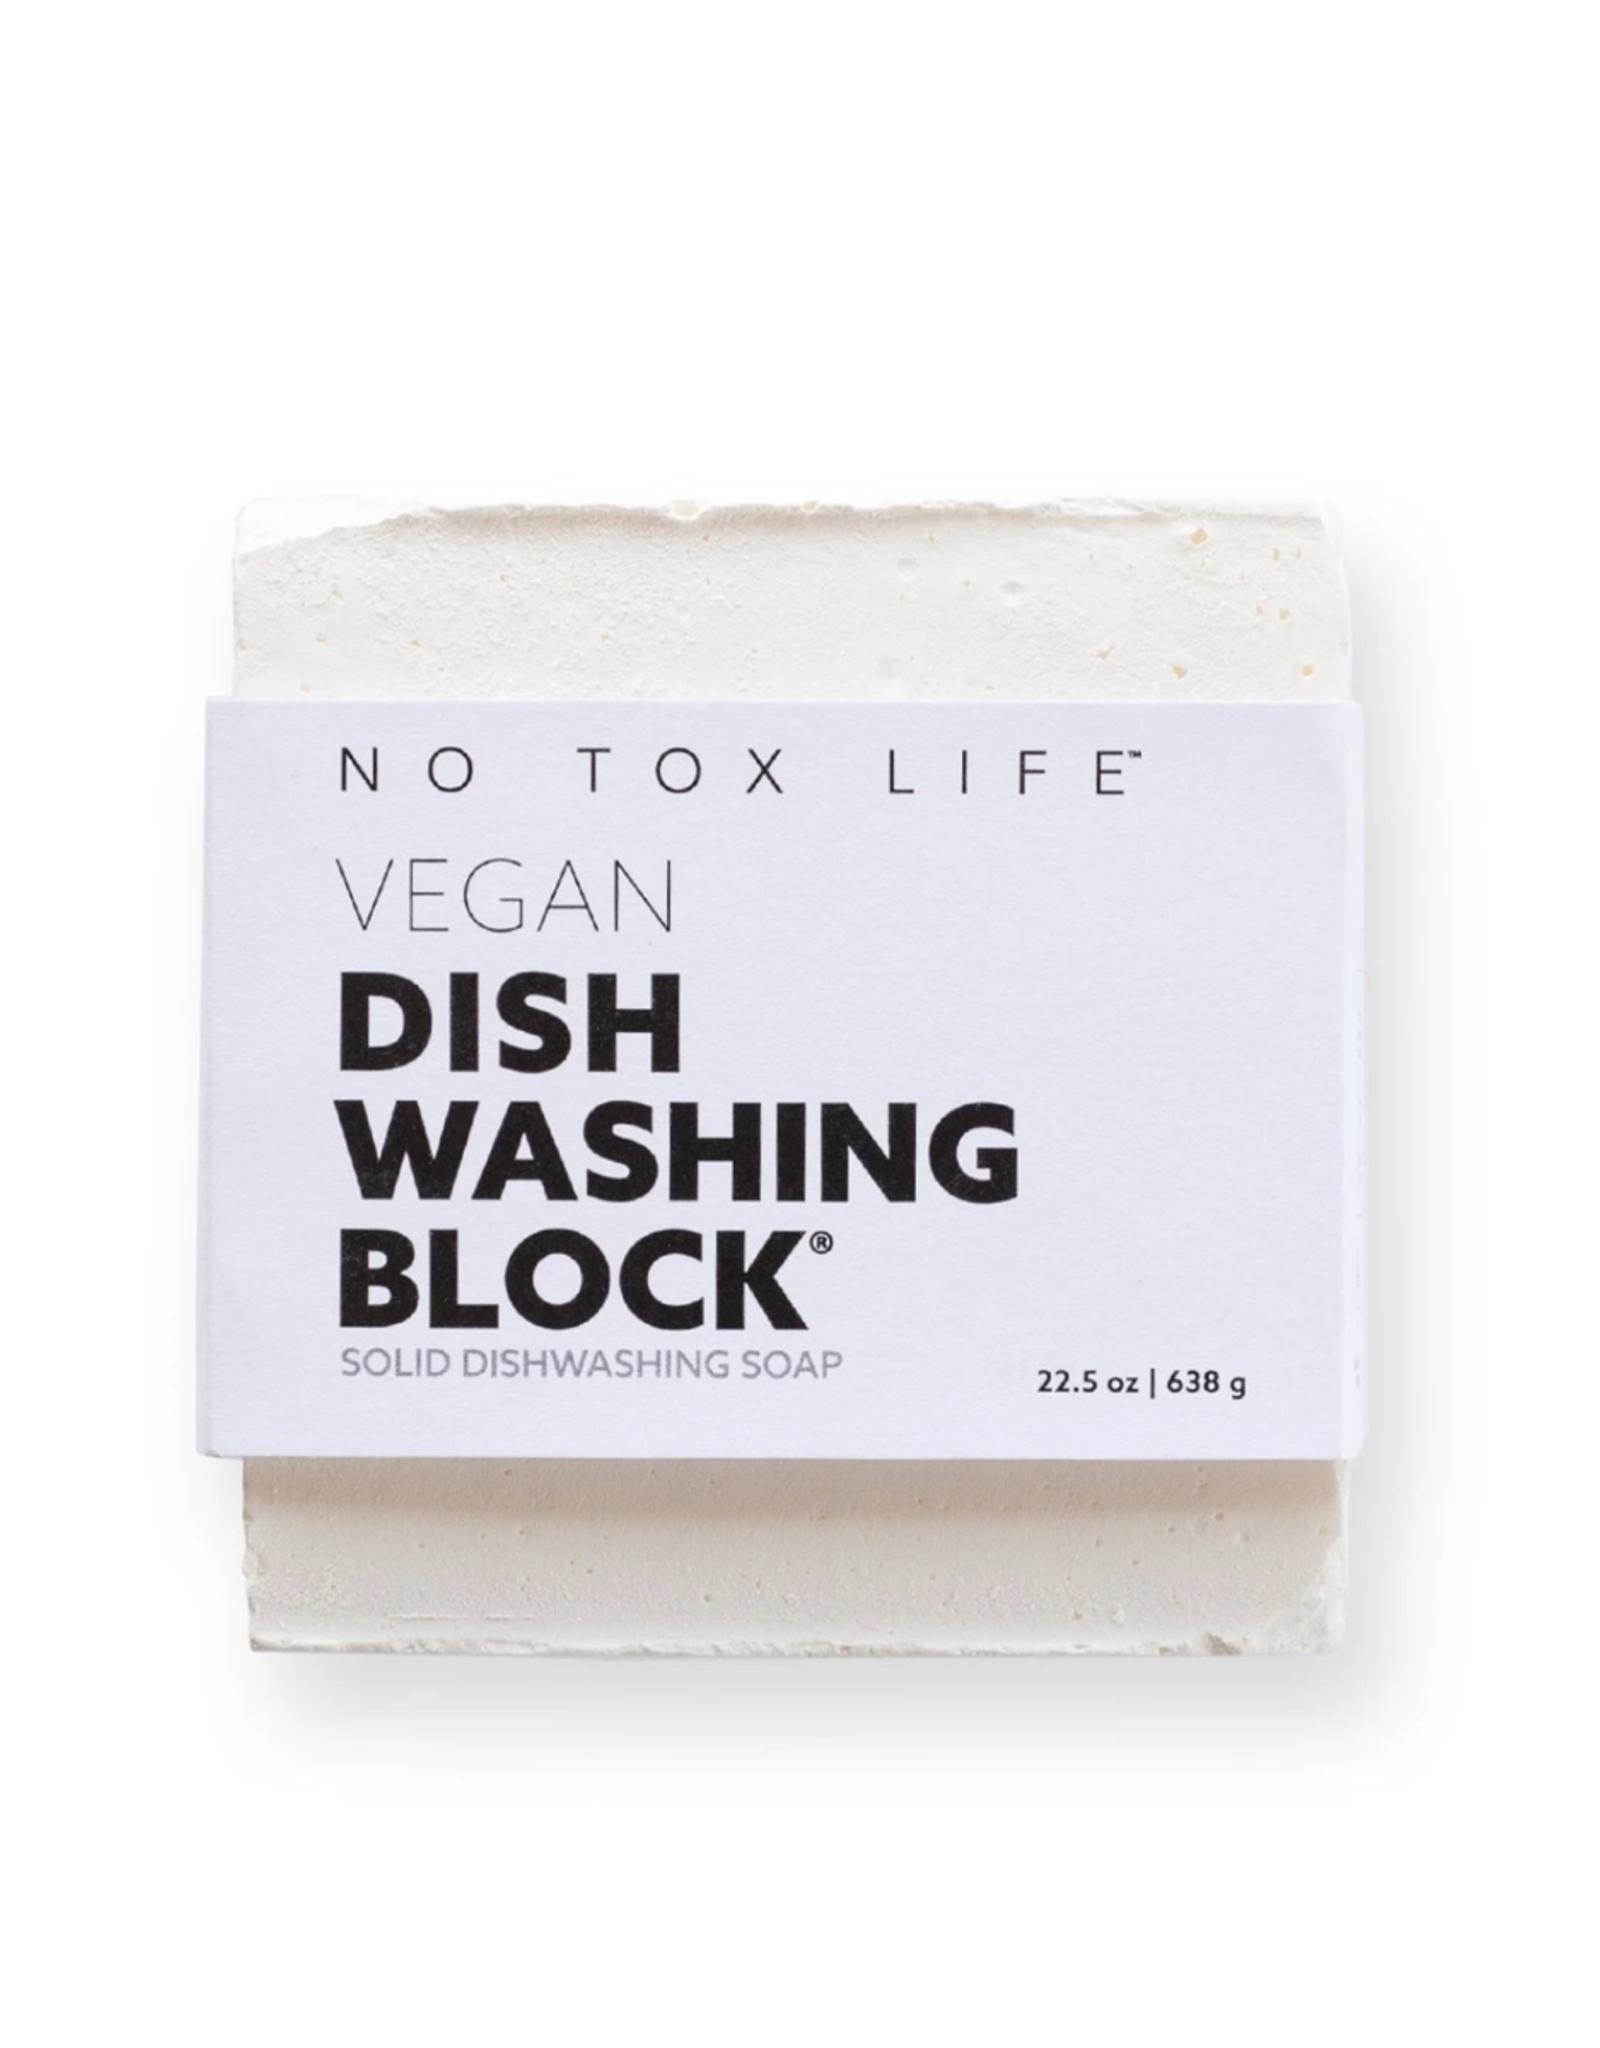 NFE - Vegan Dish Soap Block/22.5oz